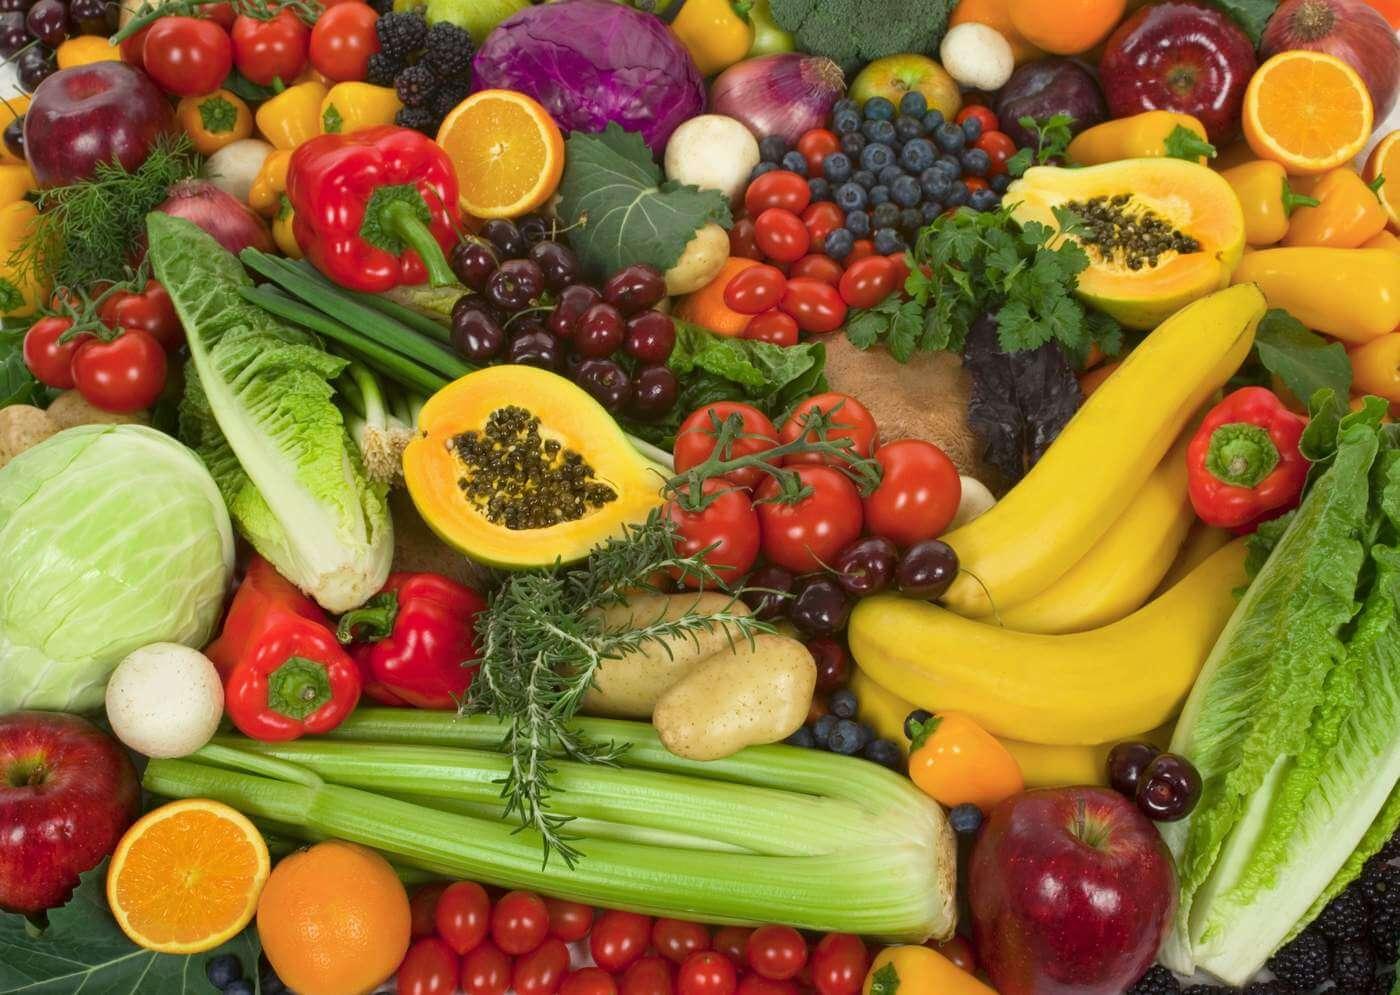 organik-tarım-organikciyizbiz (10)